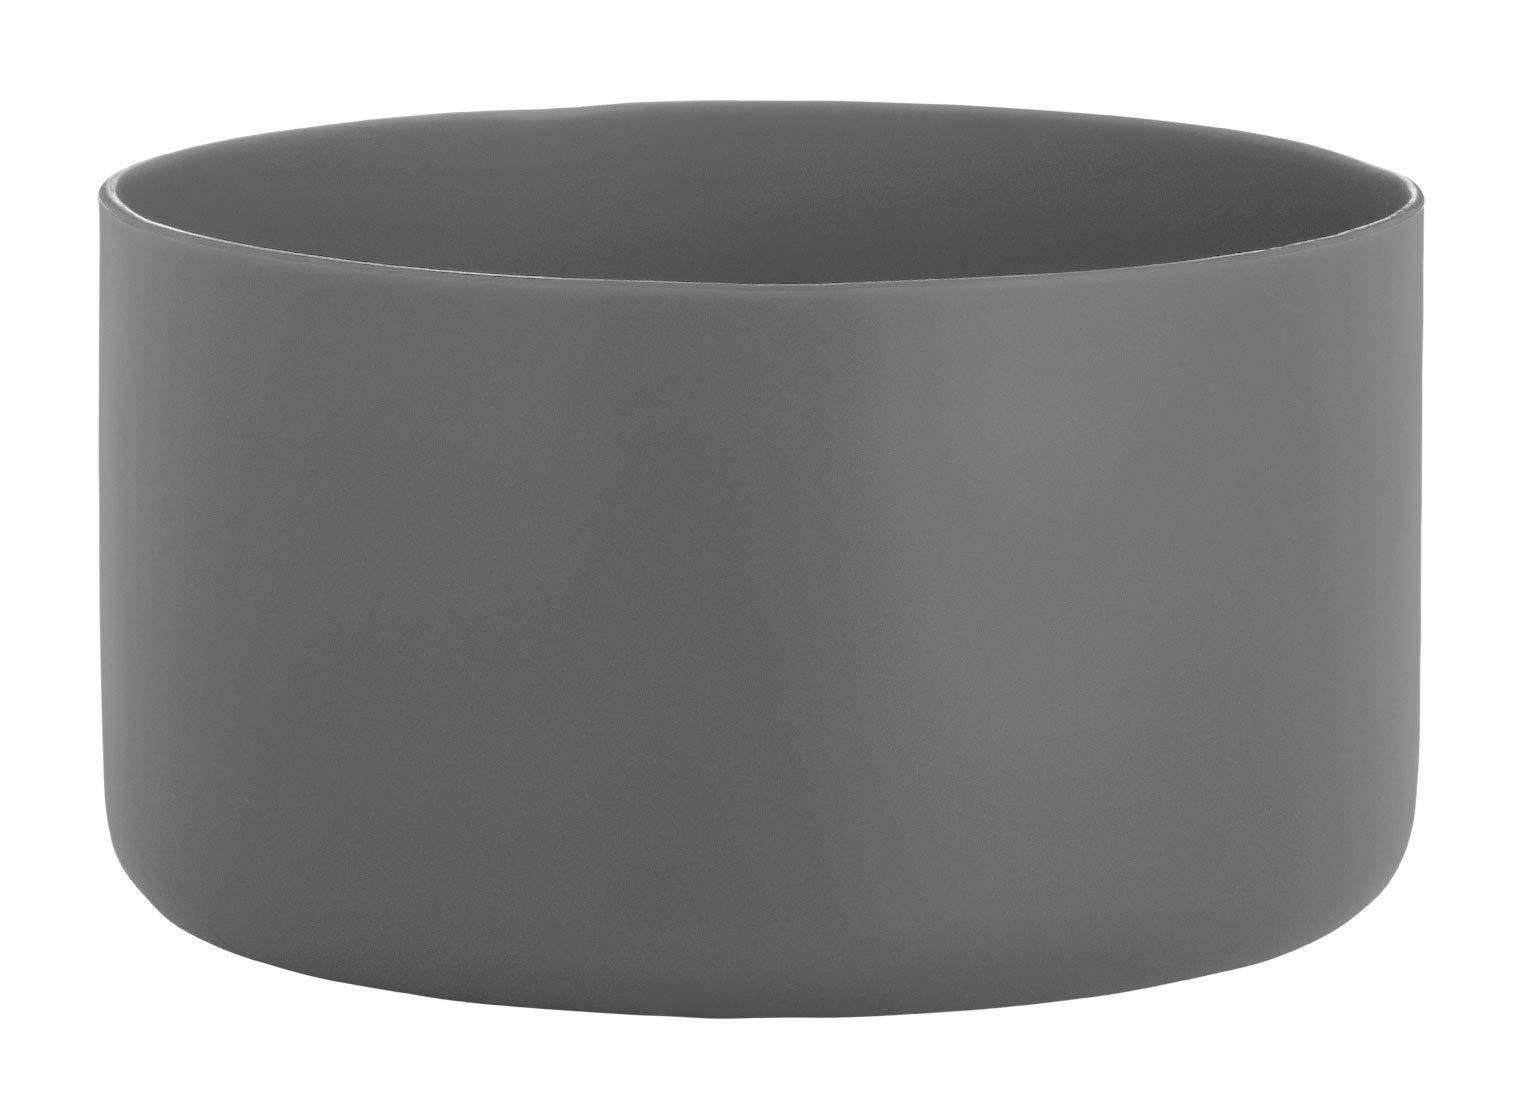 Hydro Flask Silicone Flex Boot - Medium, Stone